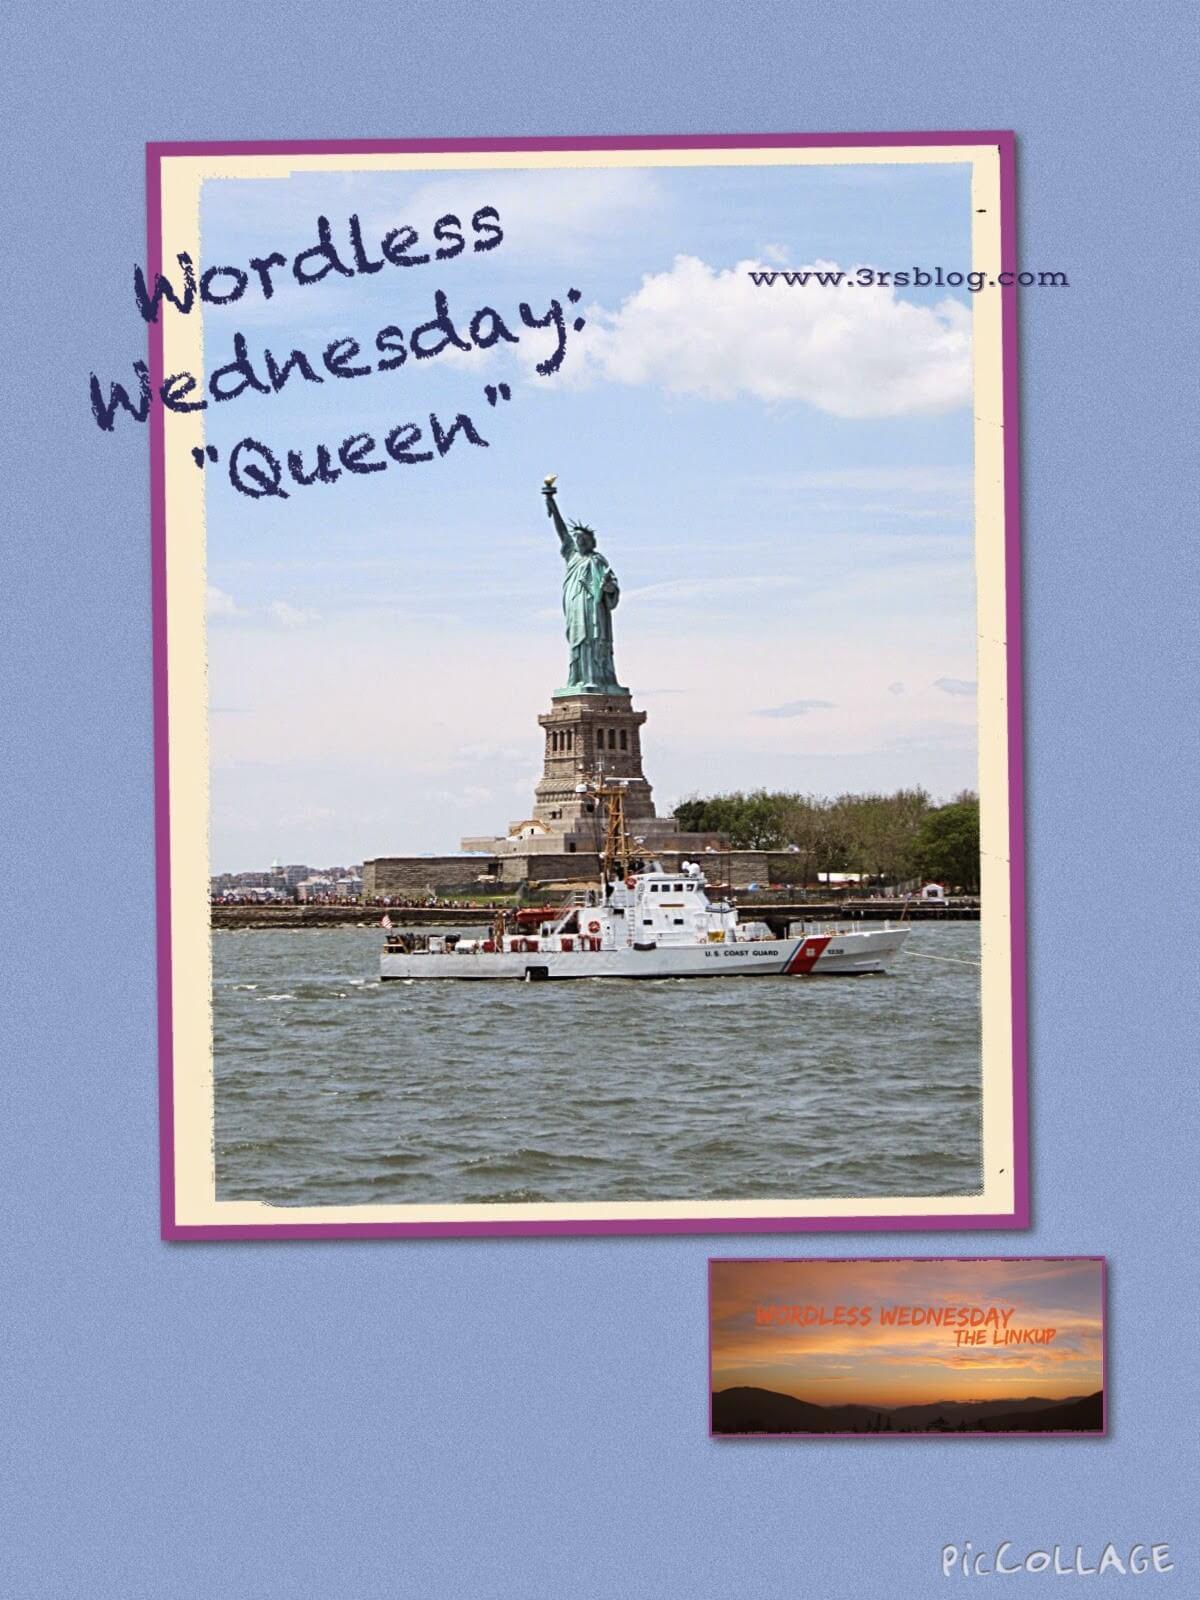 "#WordlessWednesday (Wild Card): ""Queen"""